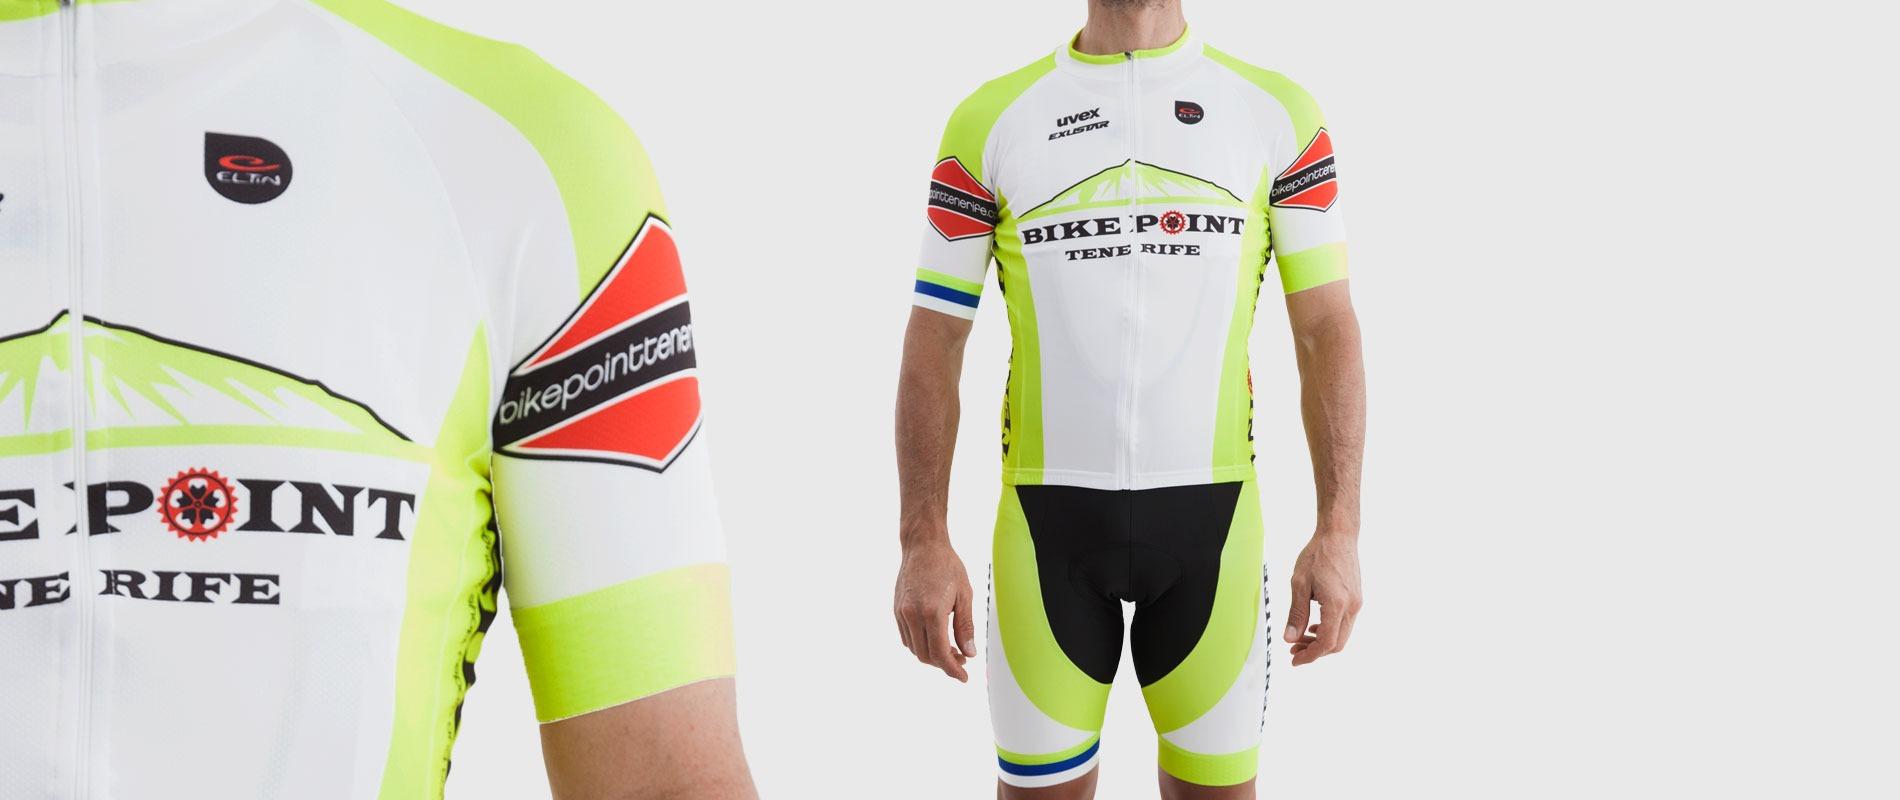 Bike Point Male White Yellow Jersey Splash Bike Point Tenerife Bike Hire & Bike Rental